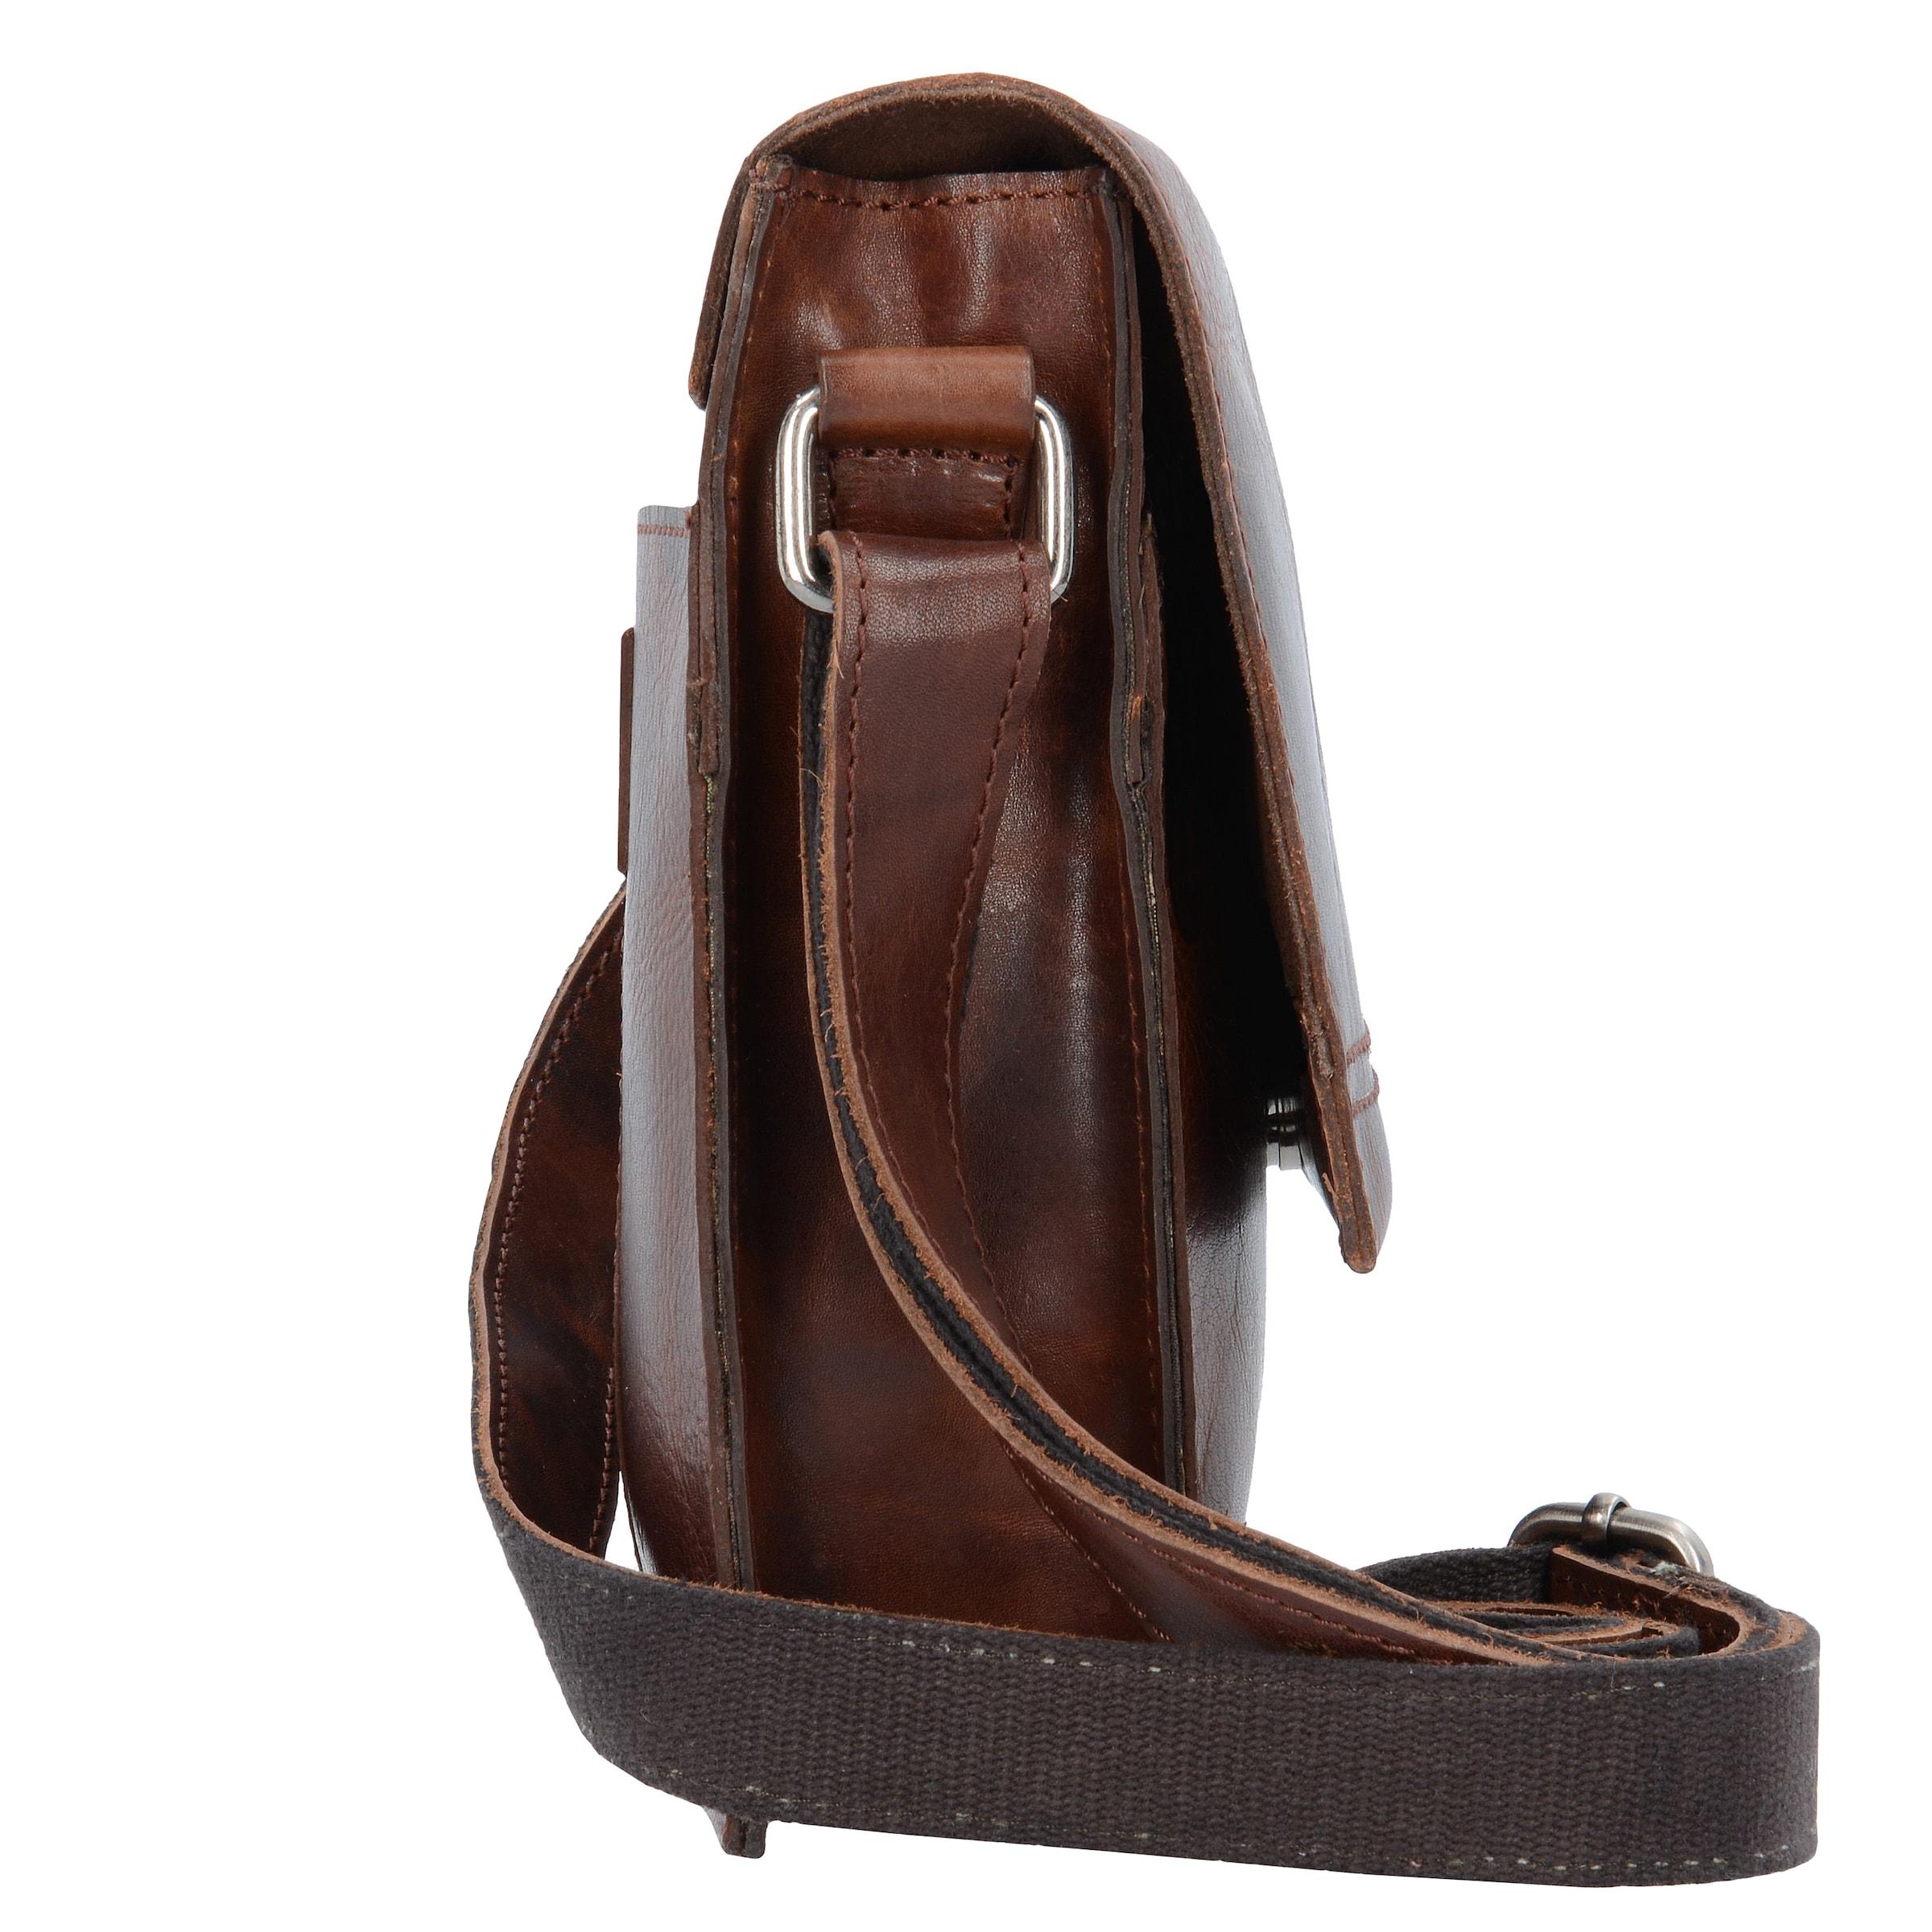 Umhängetasche Umhängetasche OckerSepia 'saddle' In Harold's Harold's L5AqSc4R3j